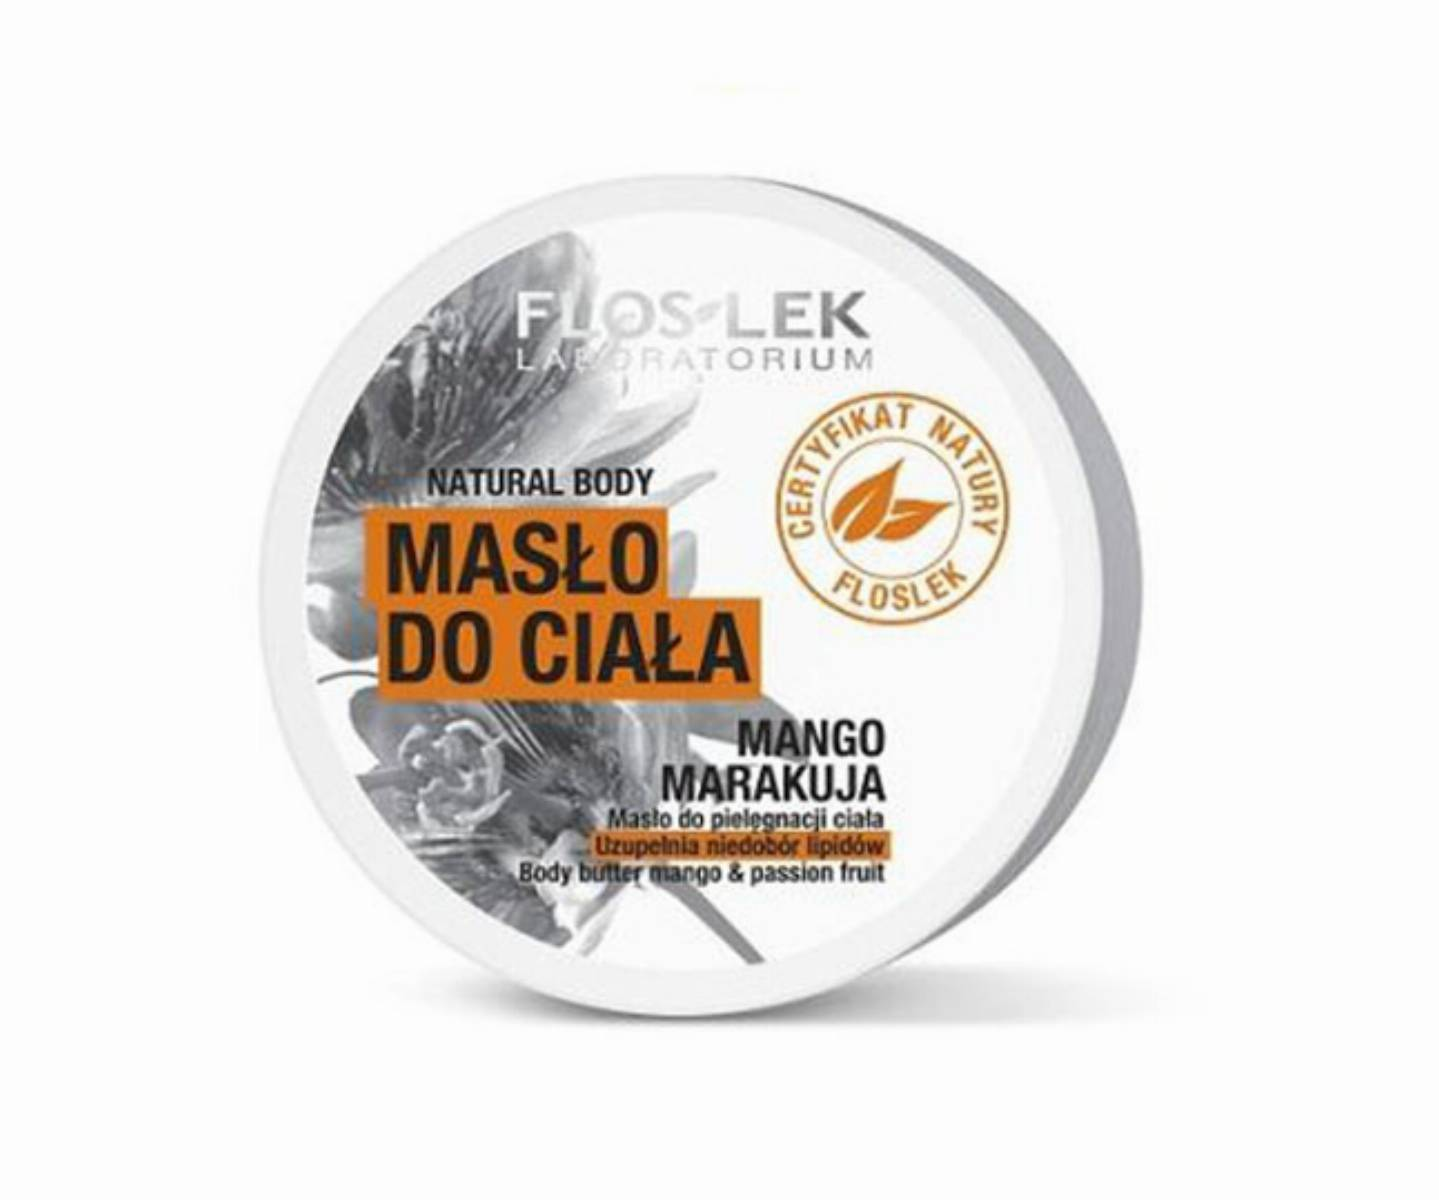 FLOSLEK MASLO DO PIELEGNACJI CIALA MANGO & MARAKUJA